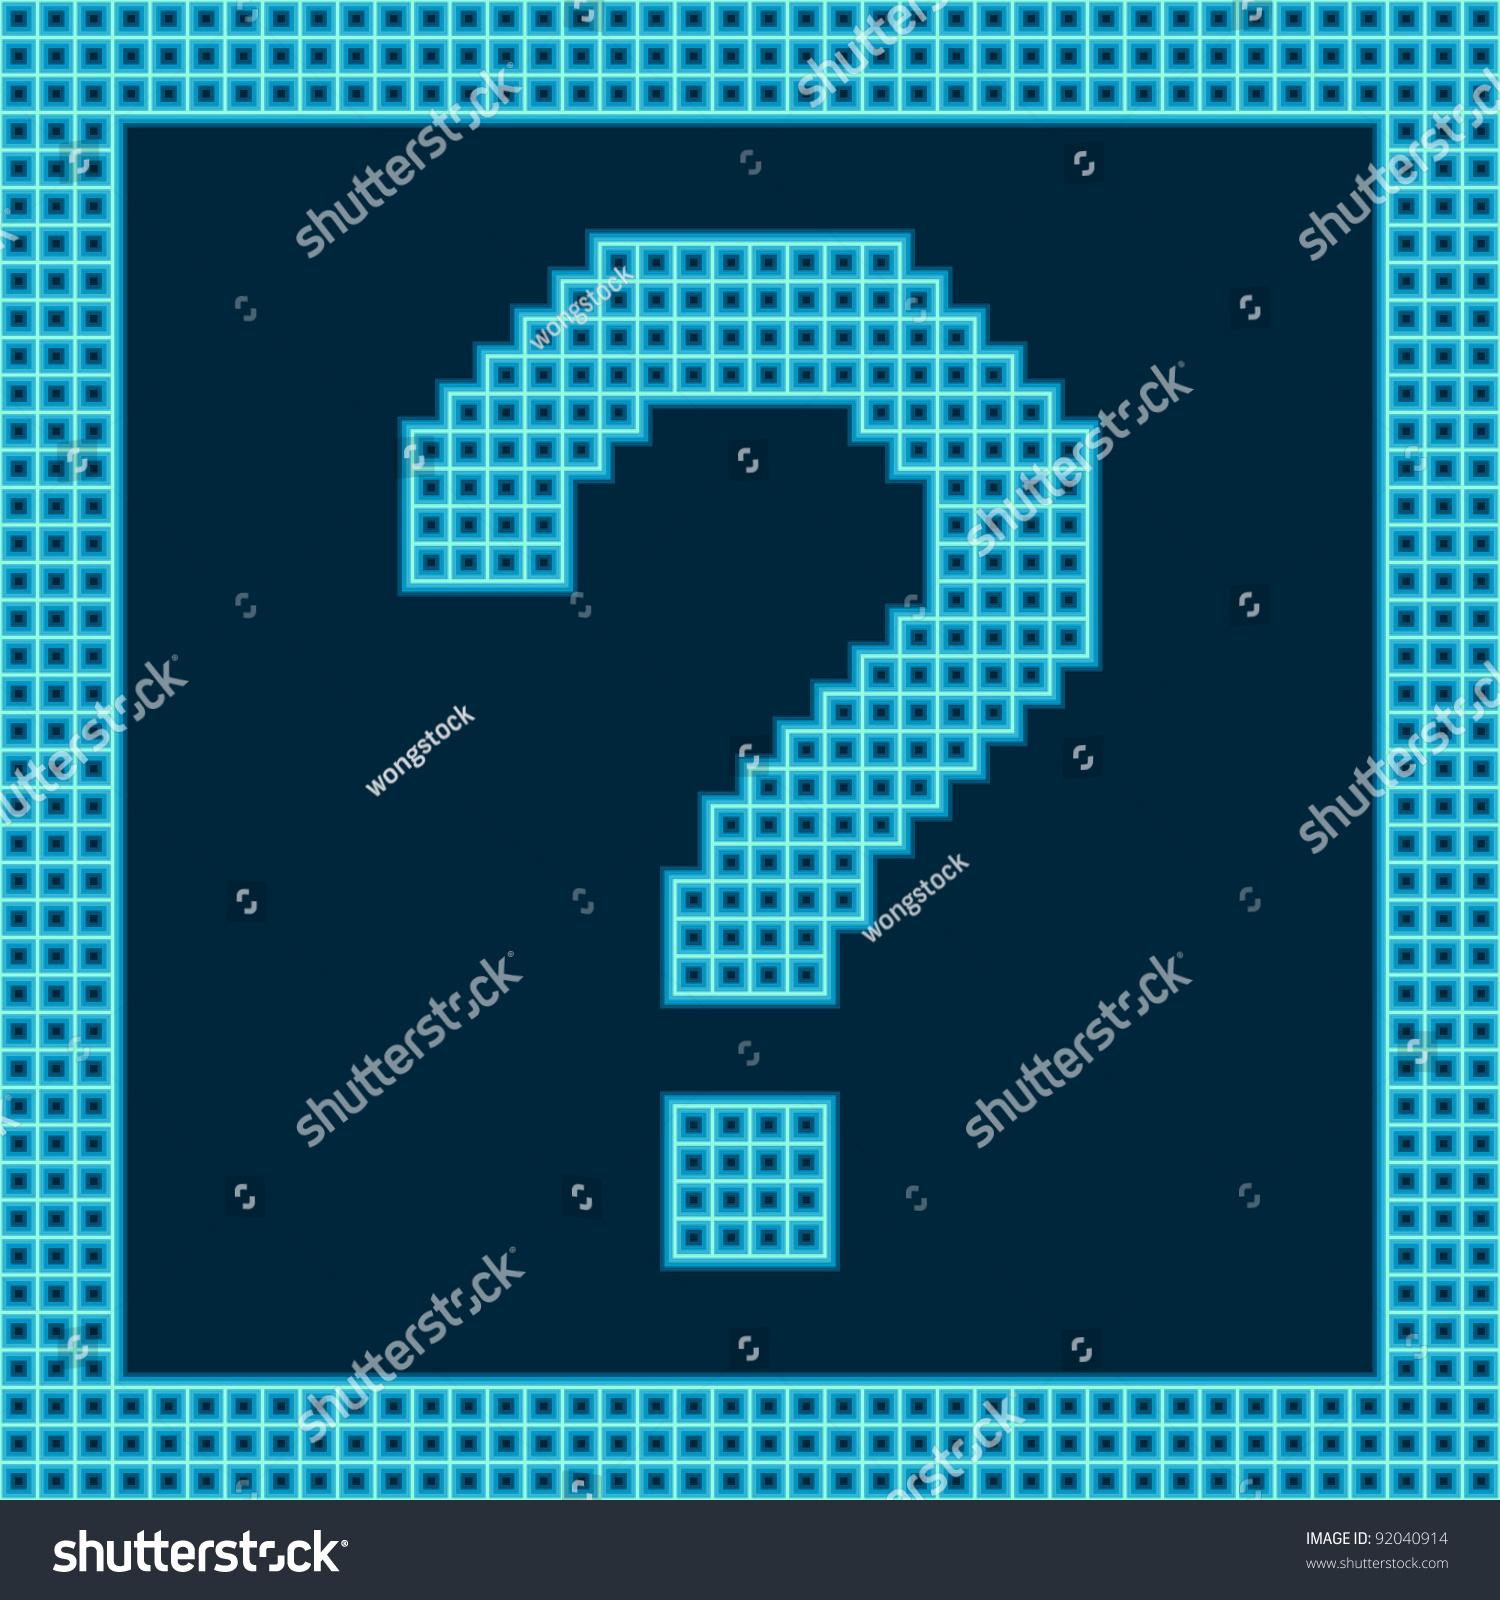 Pixel Question Mark Stock Vector Illustration 92040914